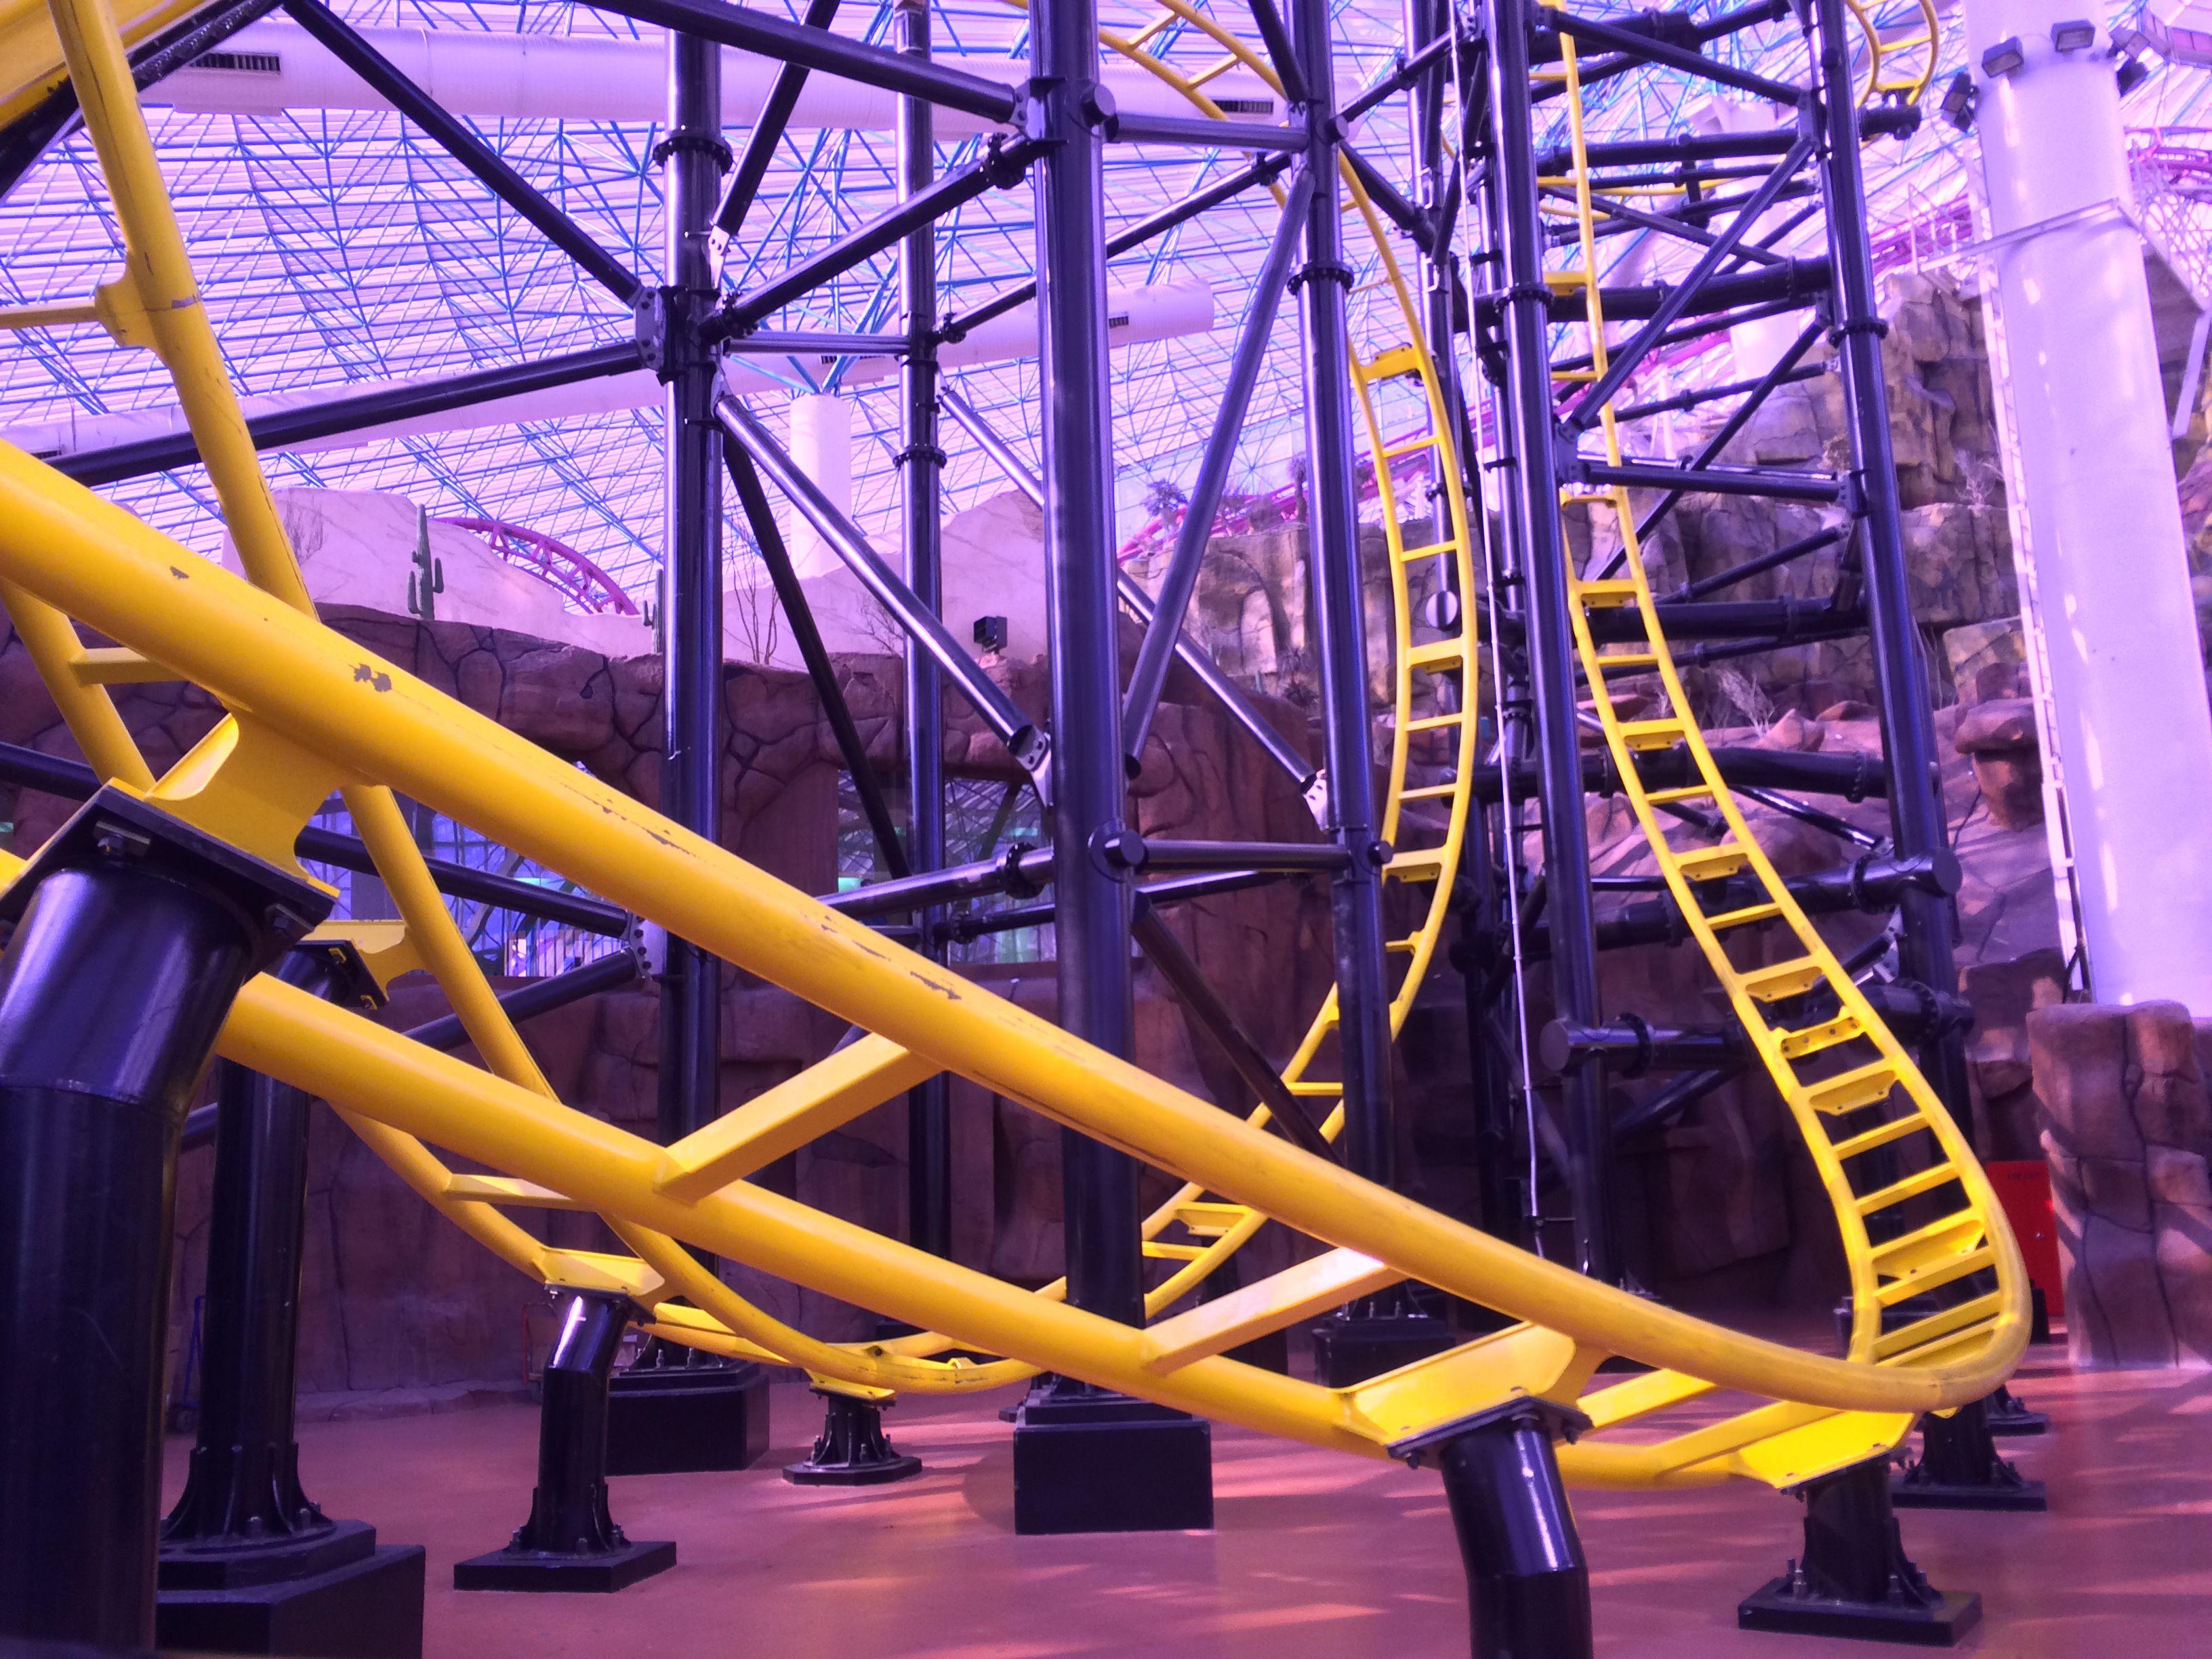 Las Vegas Roller Coasters Let It Ride On The Strip